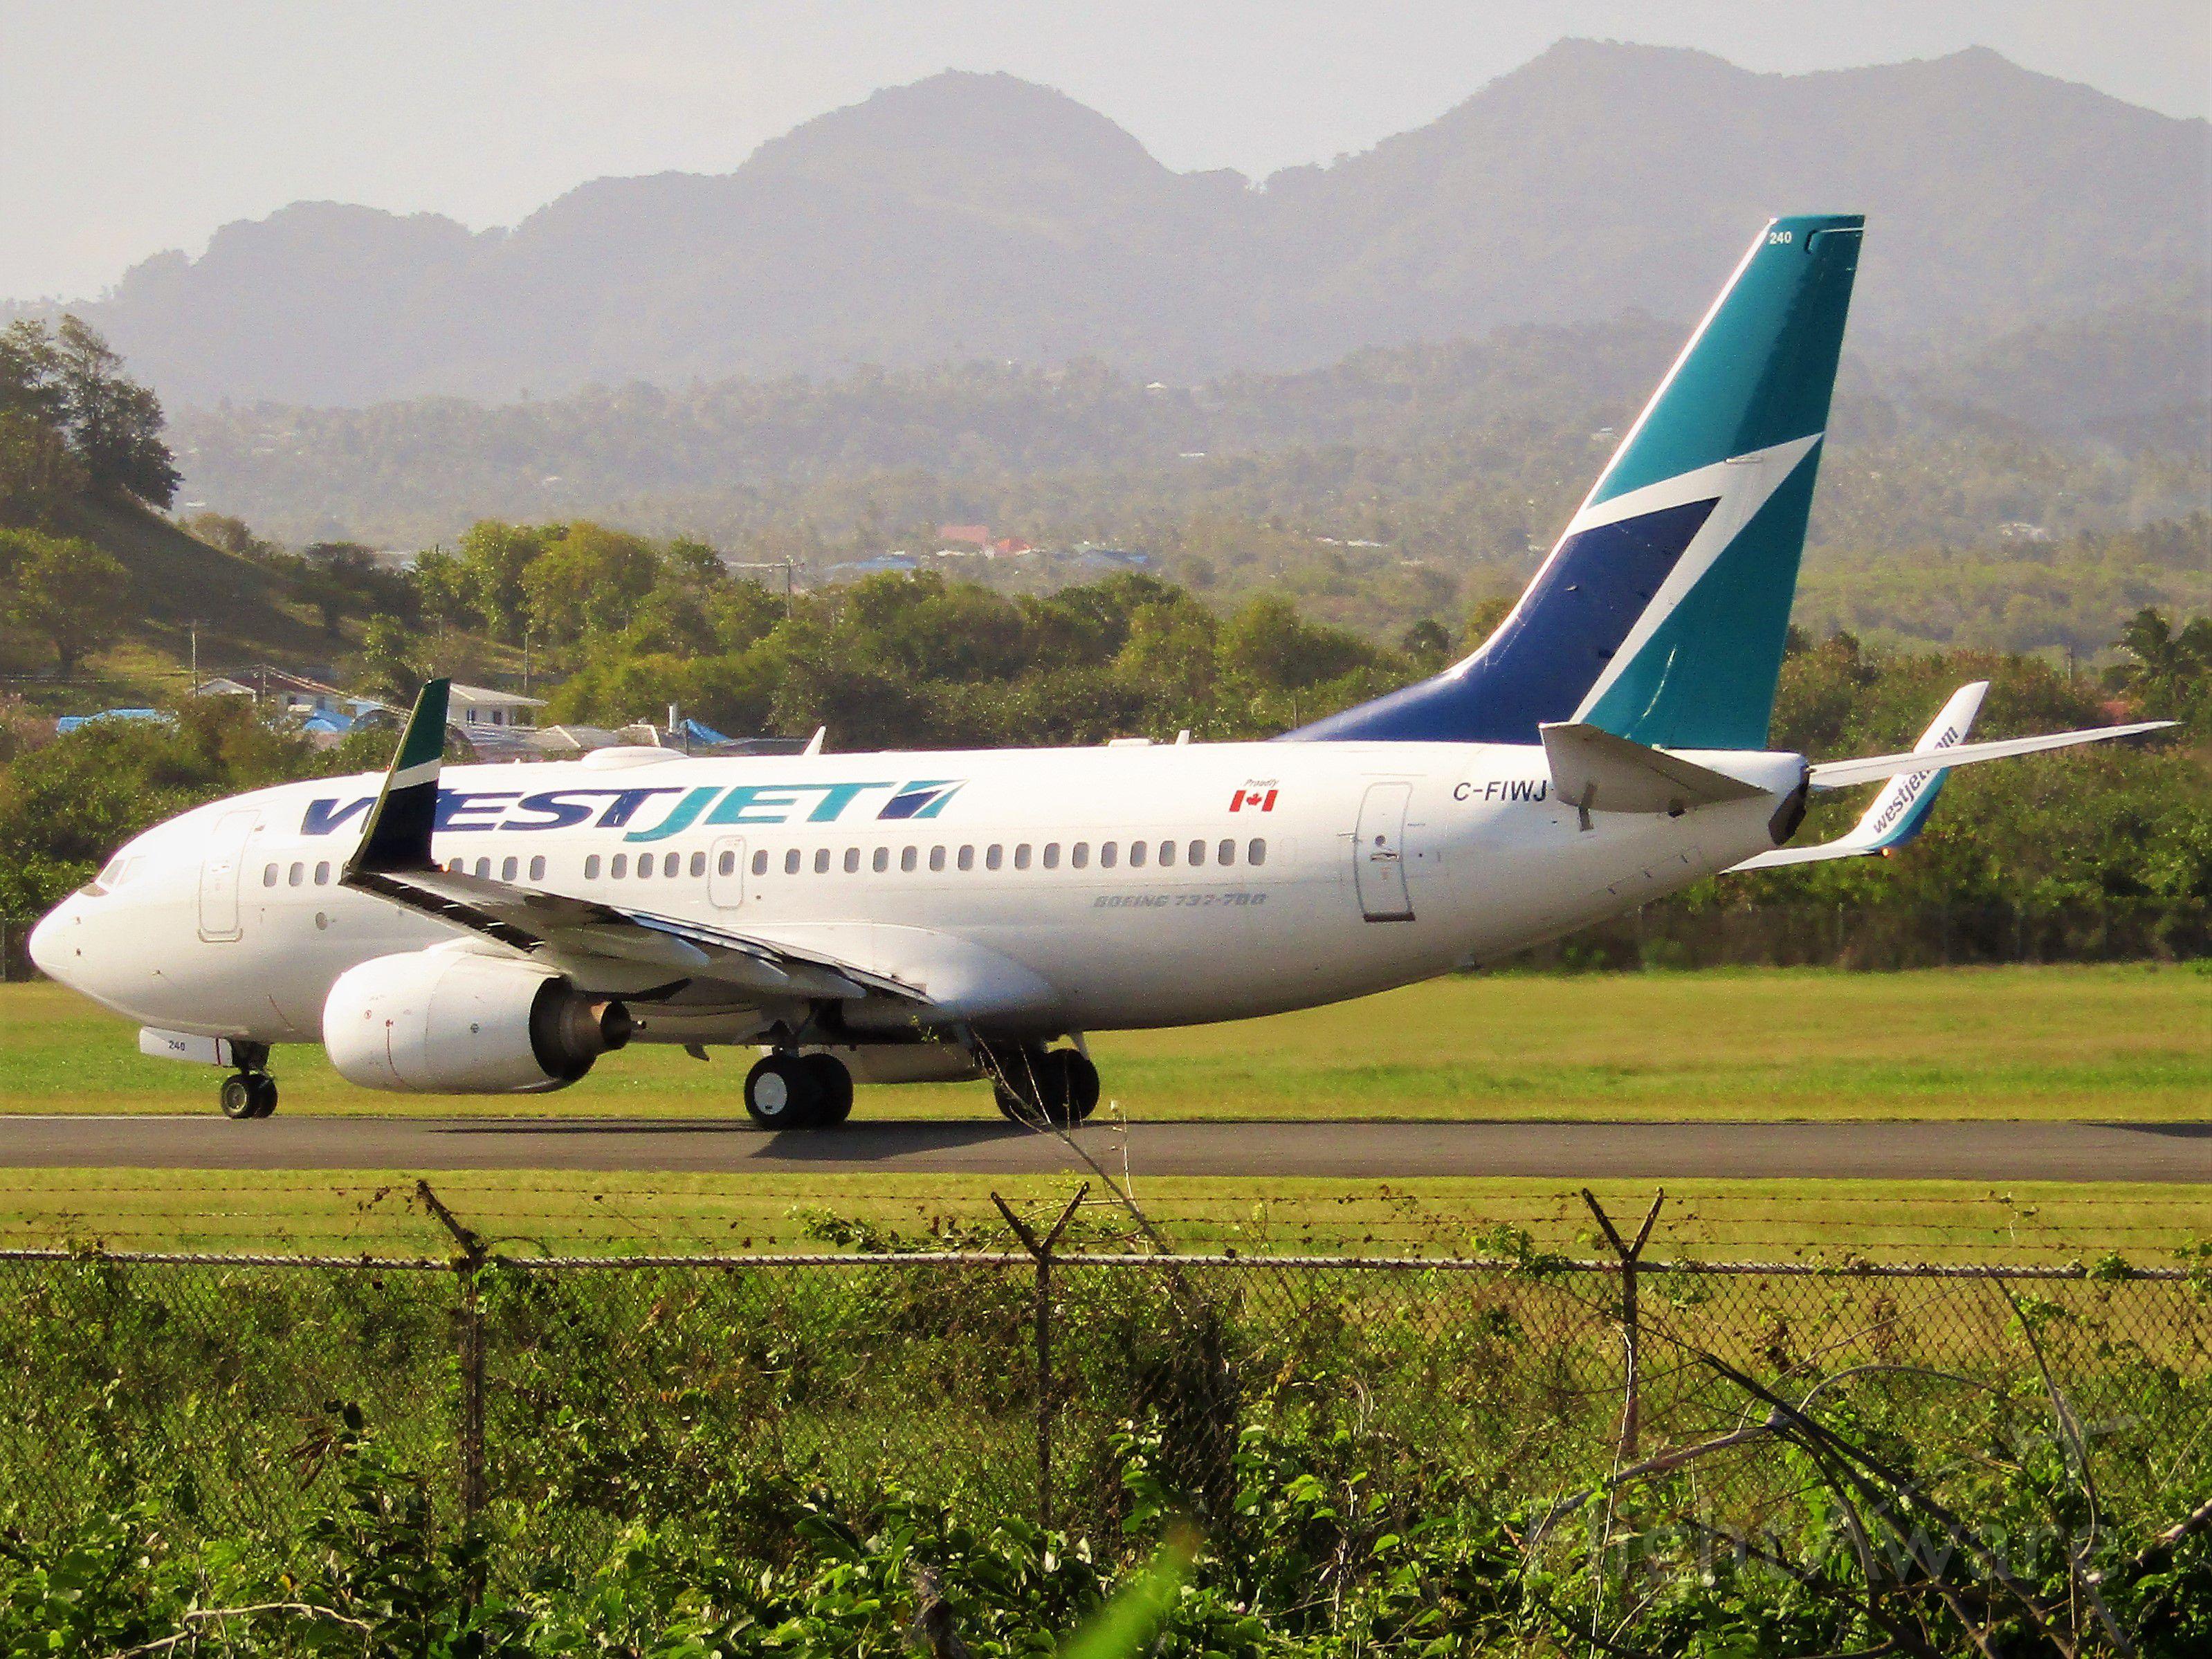 Boeing 737-700 (C-FIWJ)